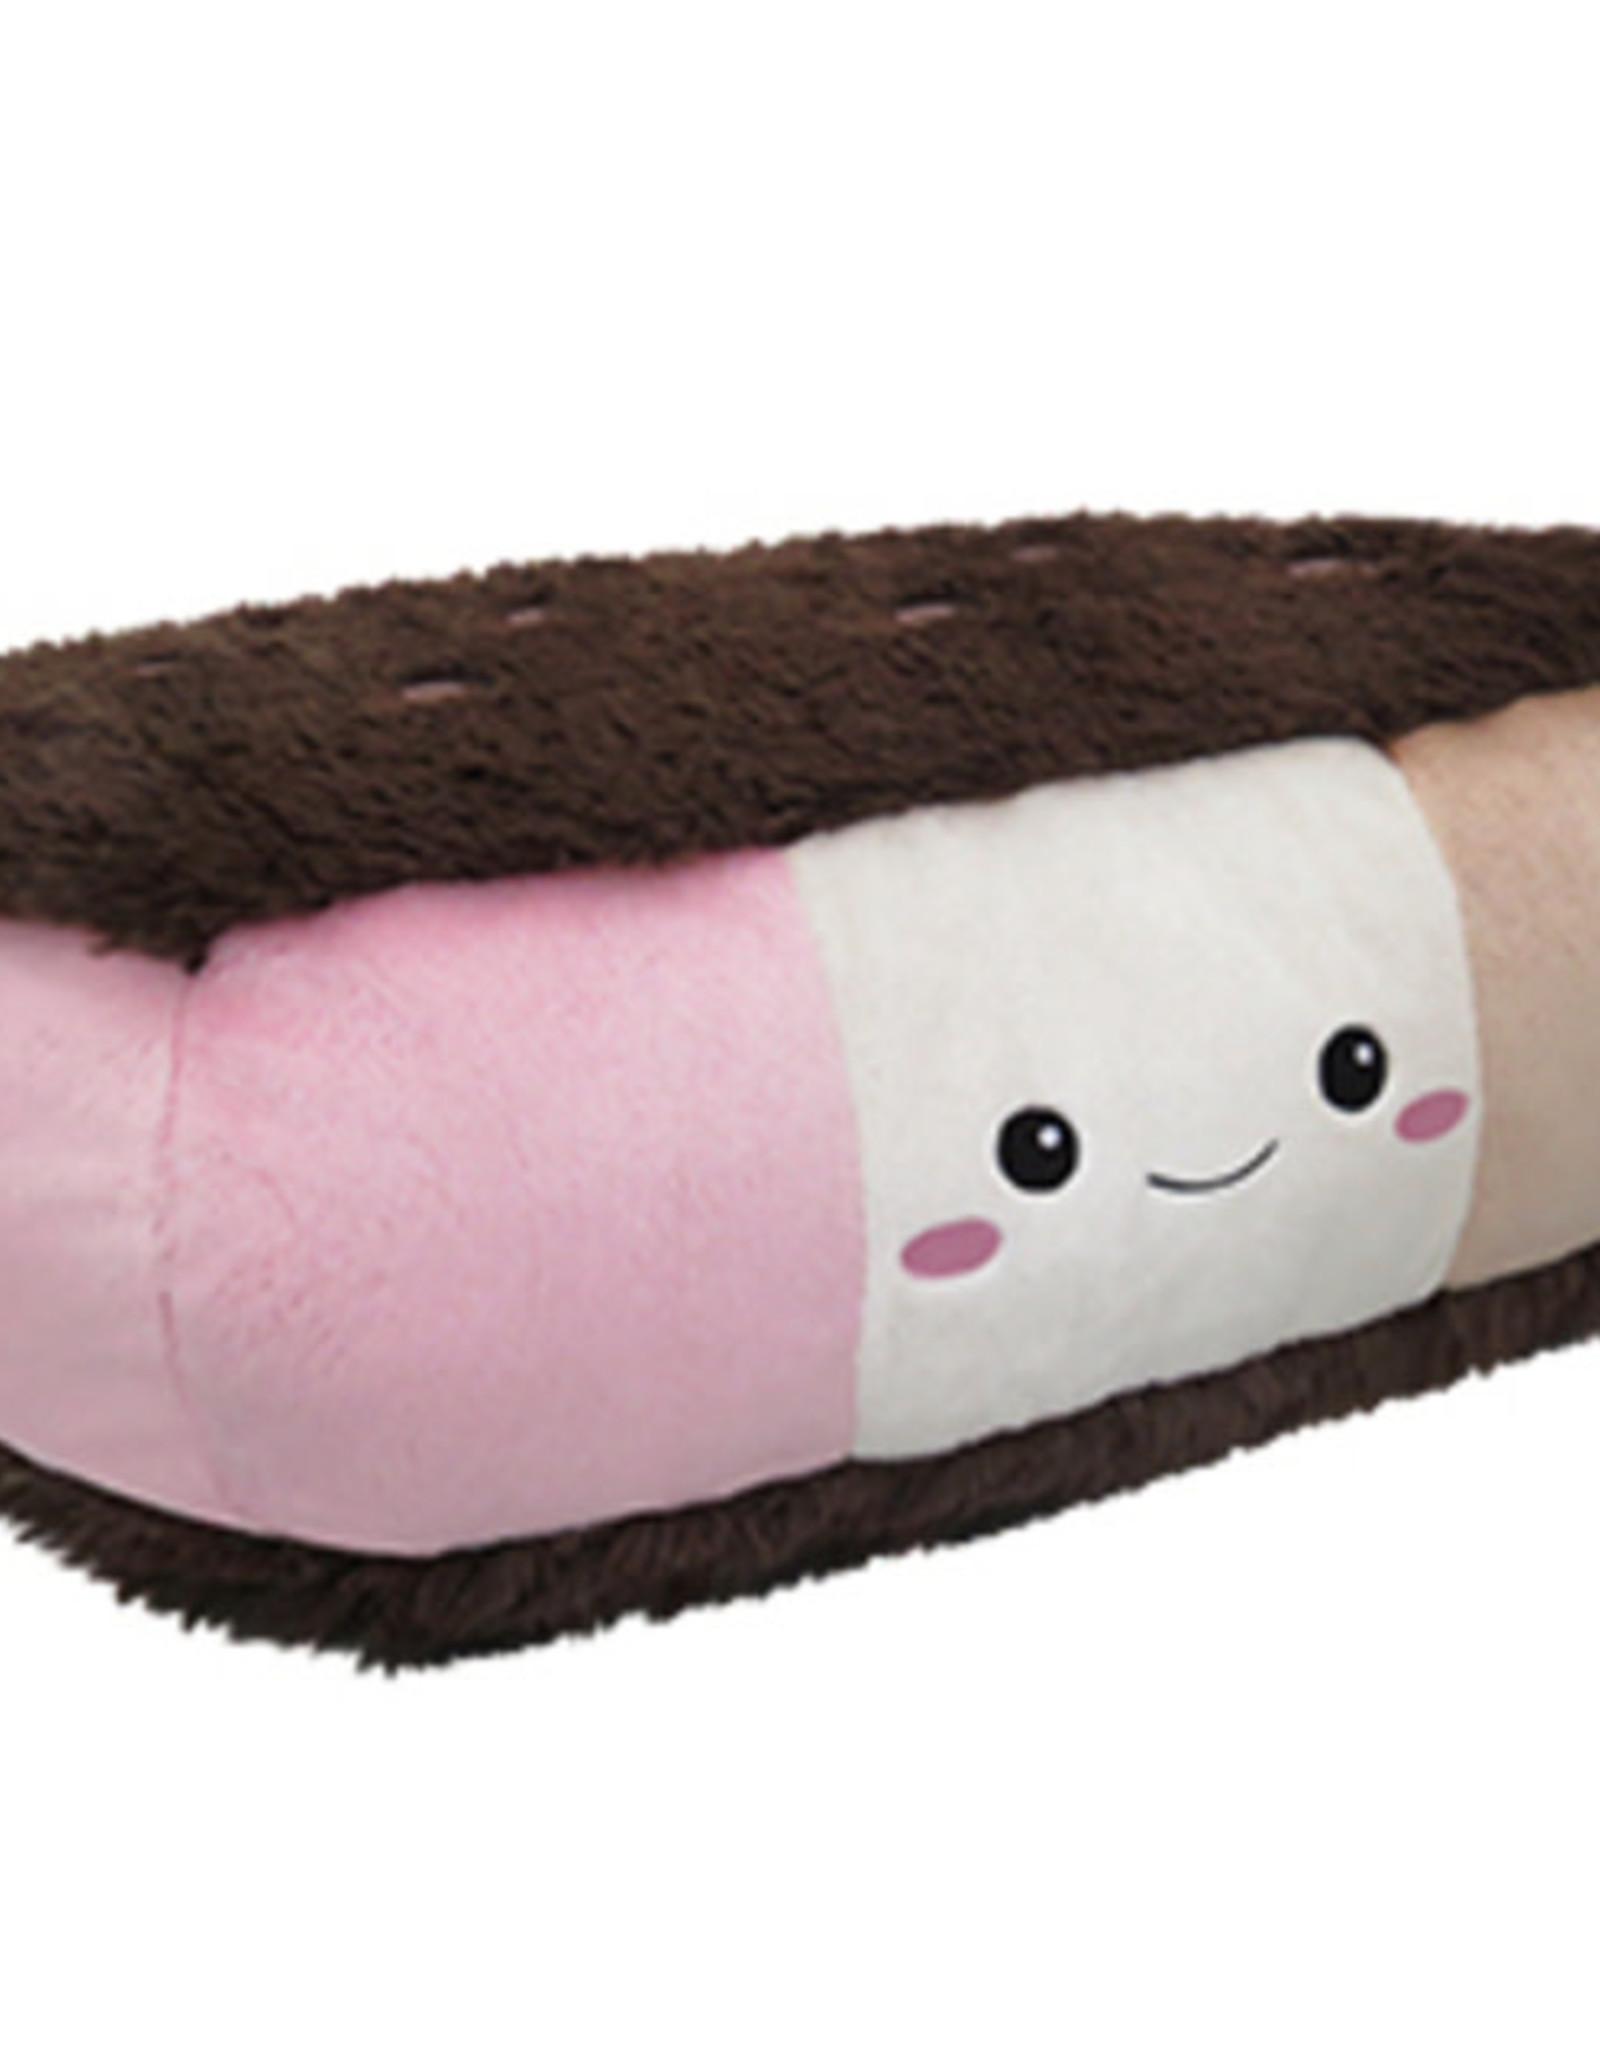 Squishable Comfort Food Ice Cream Sandwich